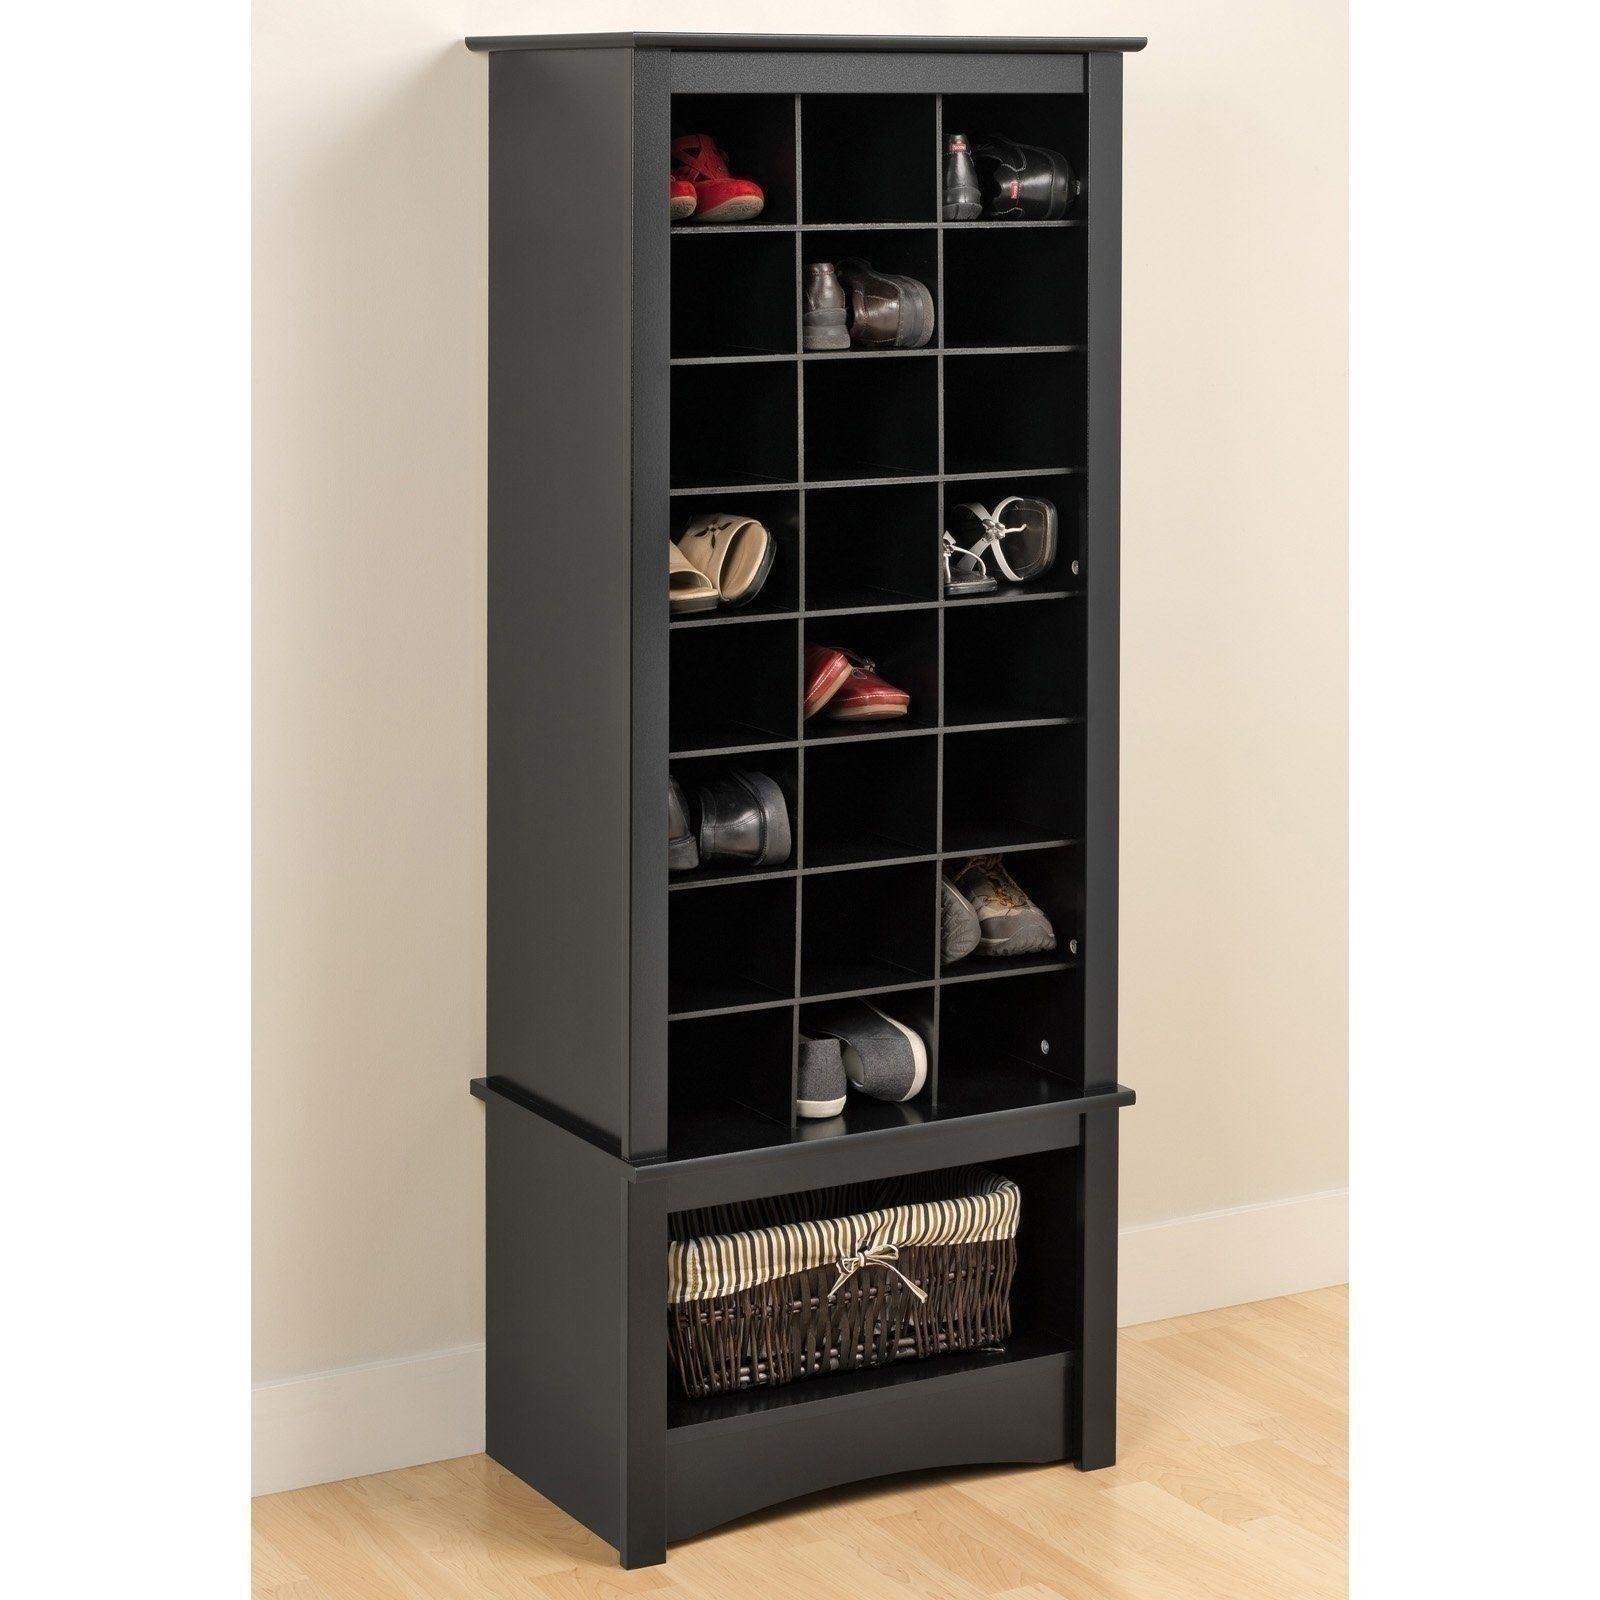 Black Finish Tall Shoe Cabinet Wooden Storage Cubbie Entryway Organizer Rack